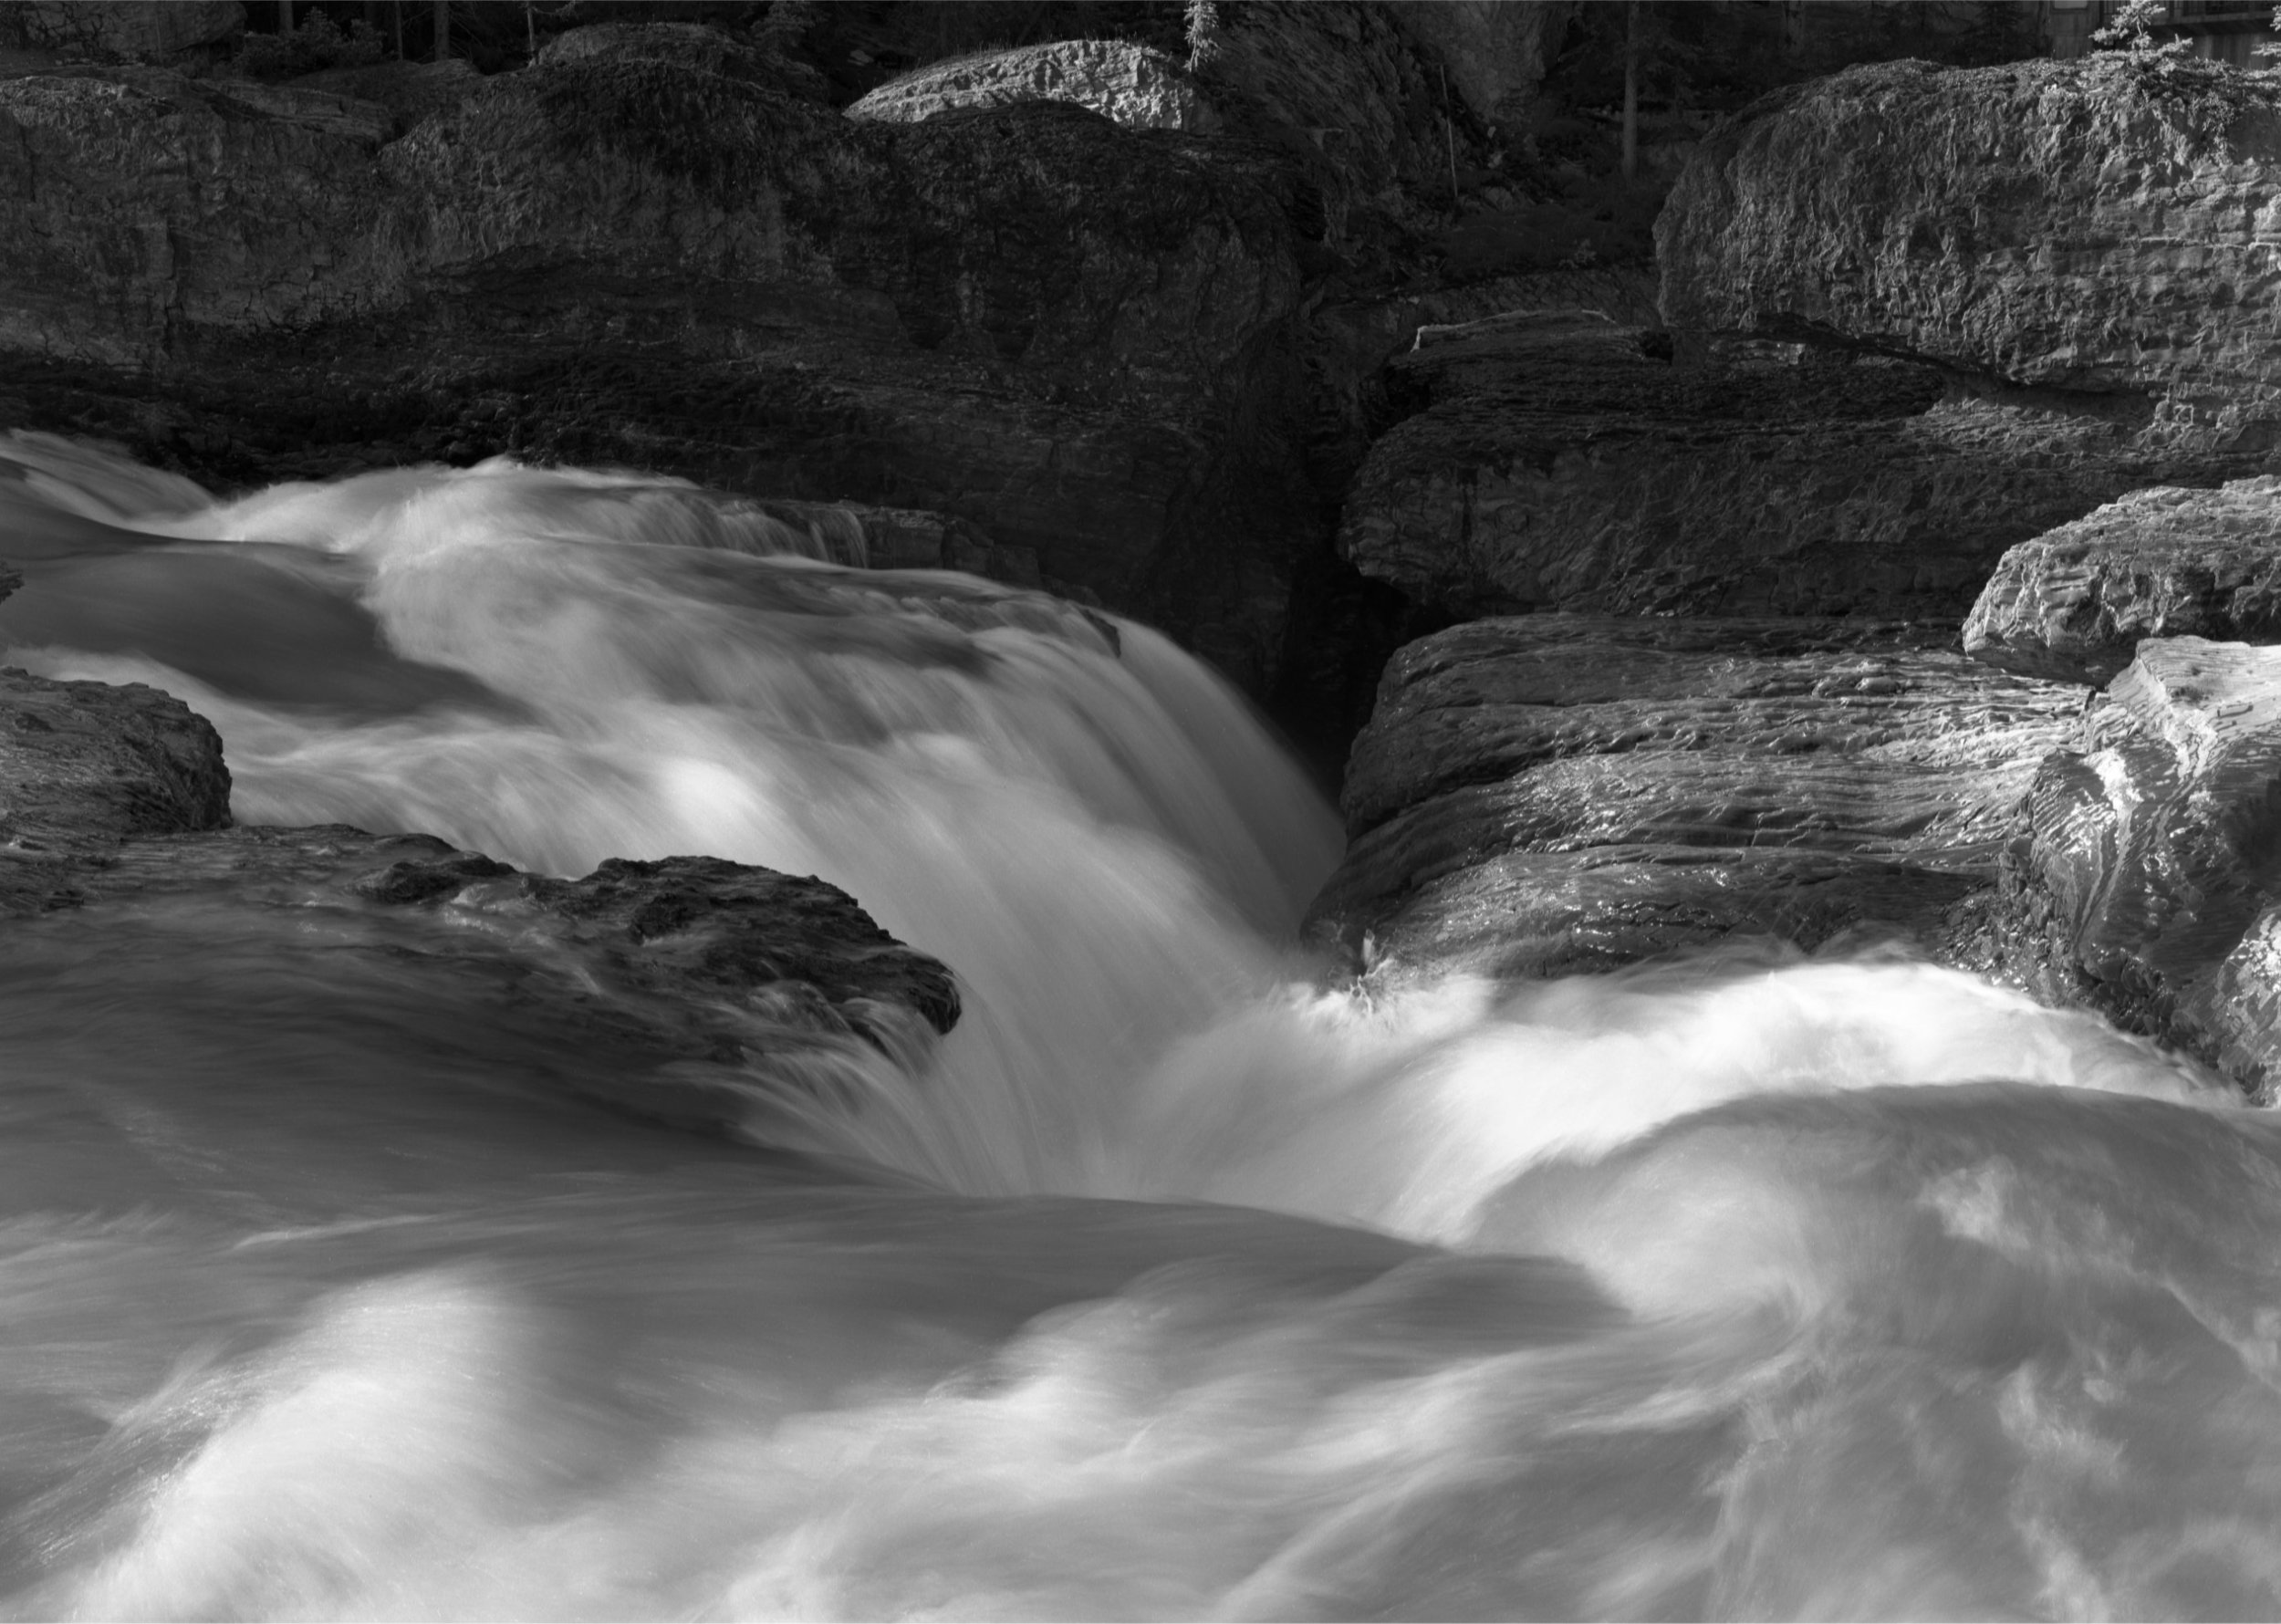 067_Kicking_Horse_River_Falls.jpg